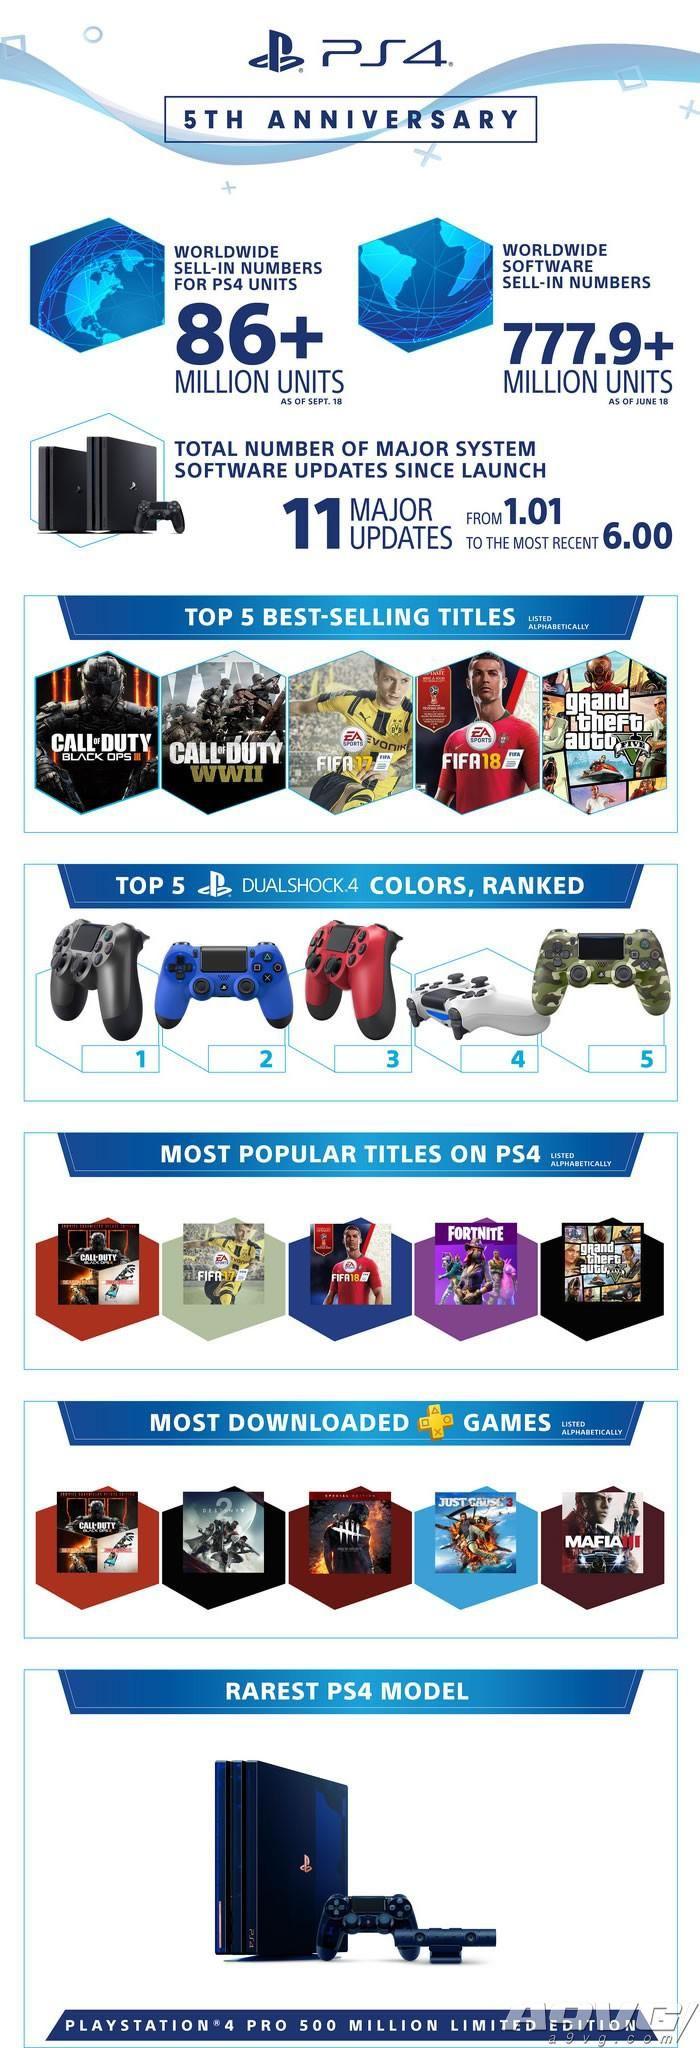 SIE公布PS4五周年各种统计数据 并推出CODBO4同捆主机